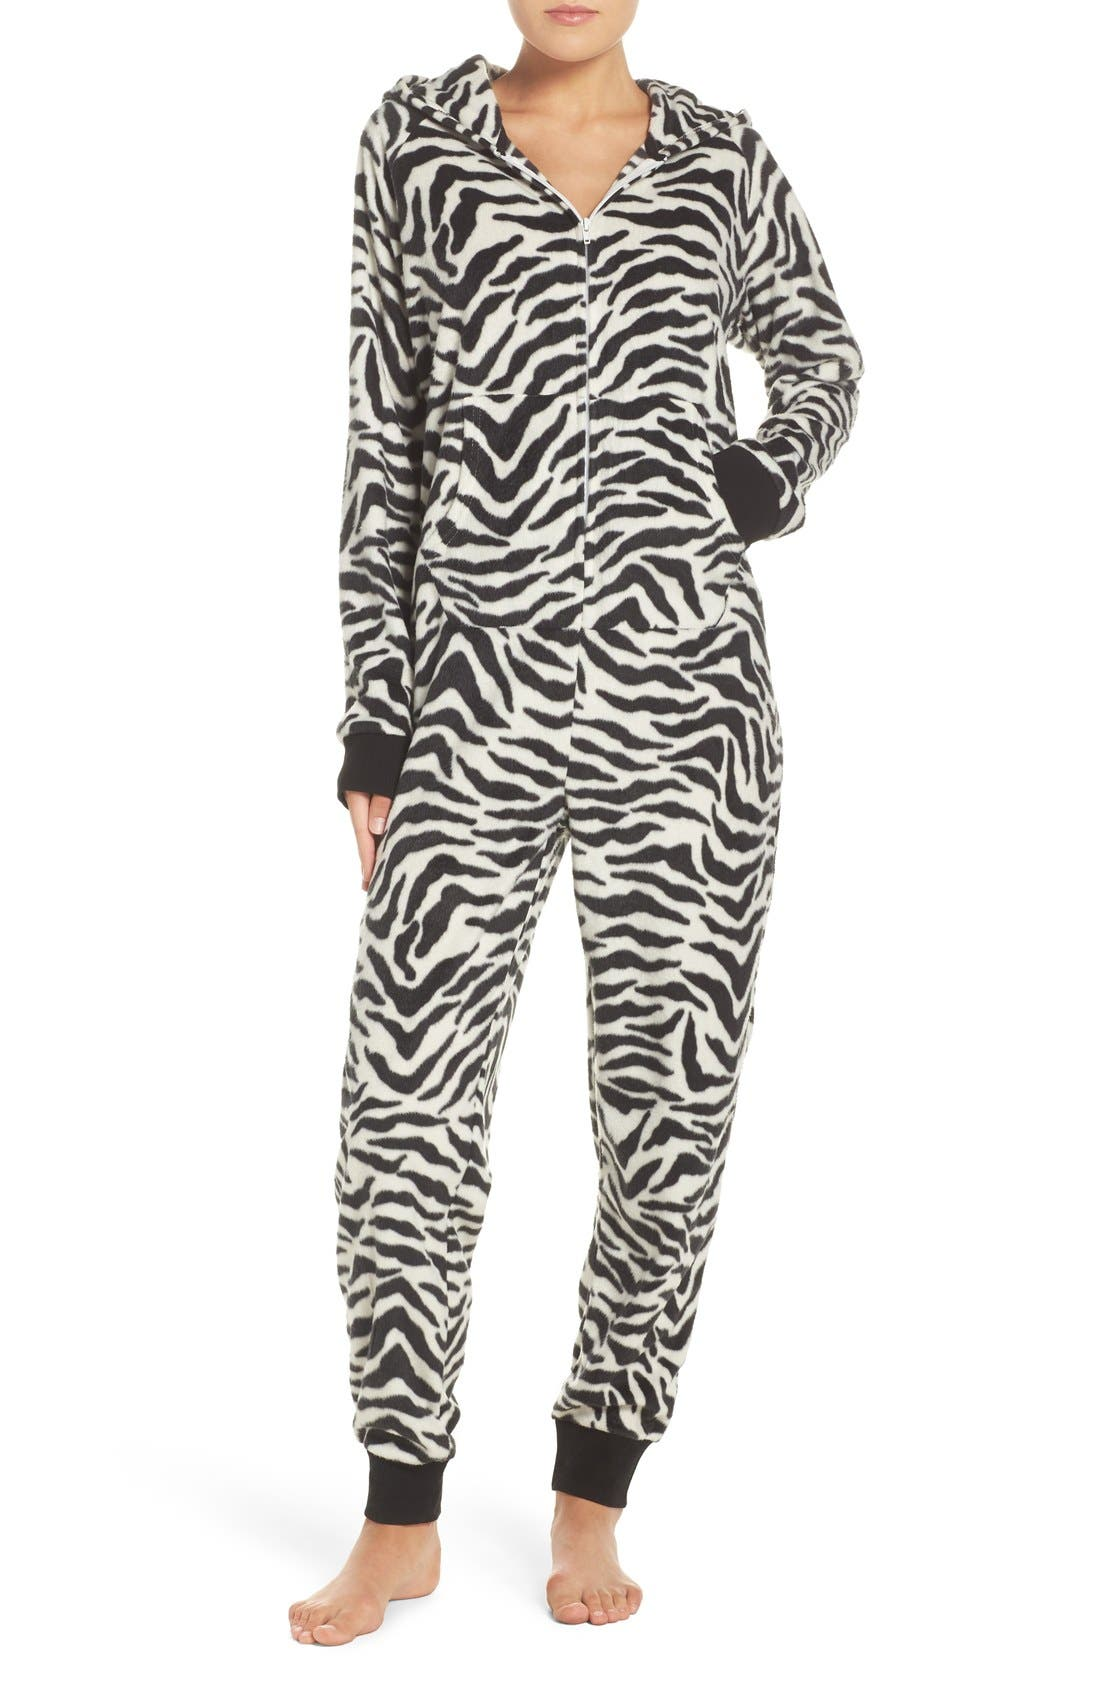 Alternate Image 1 Selected - COZY ZOE 'Critter' Zebra One-Piece Pajamas